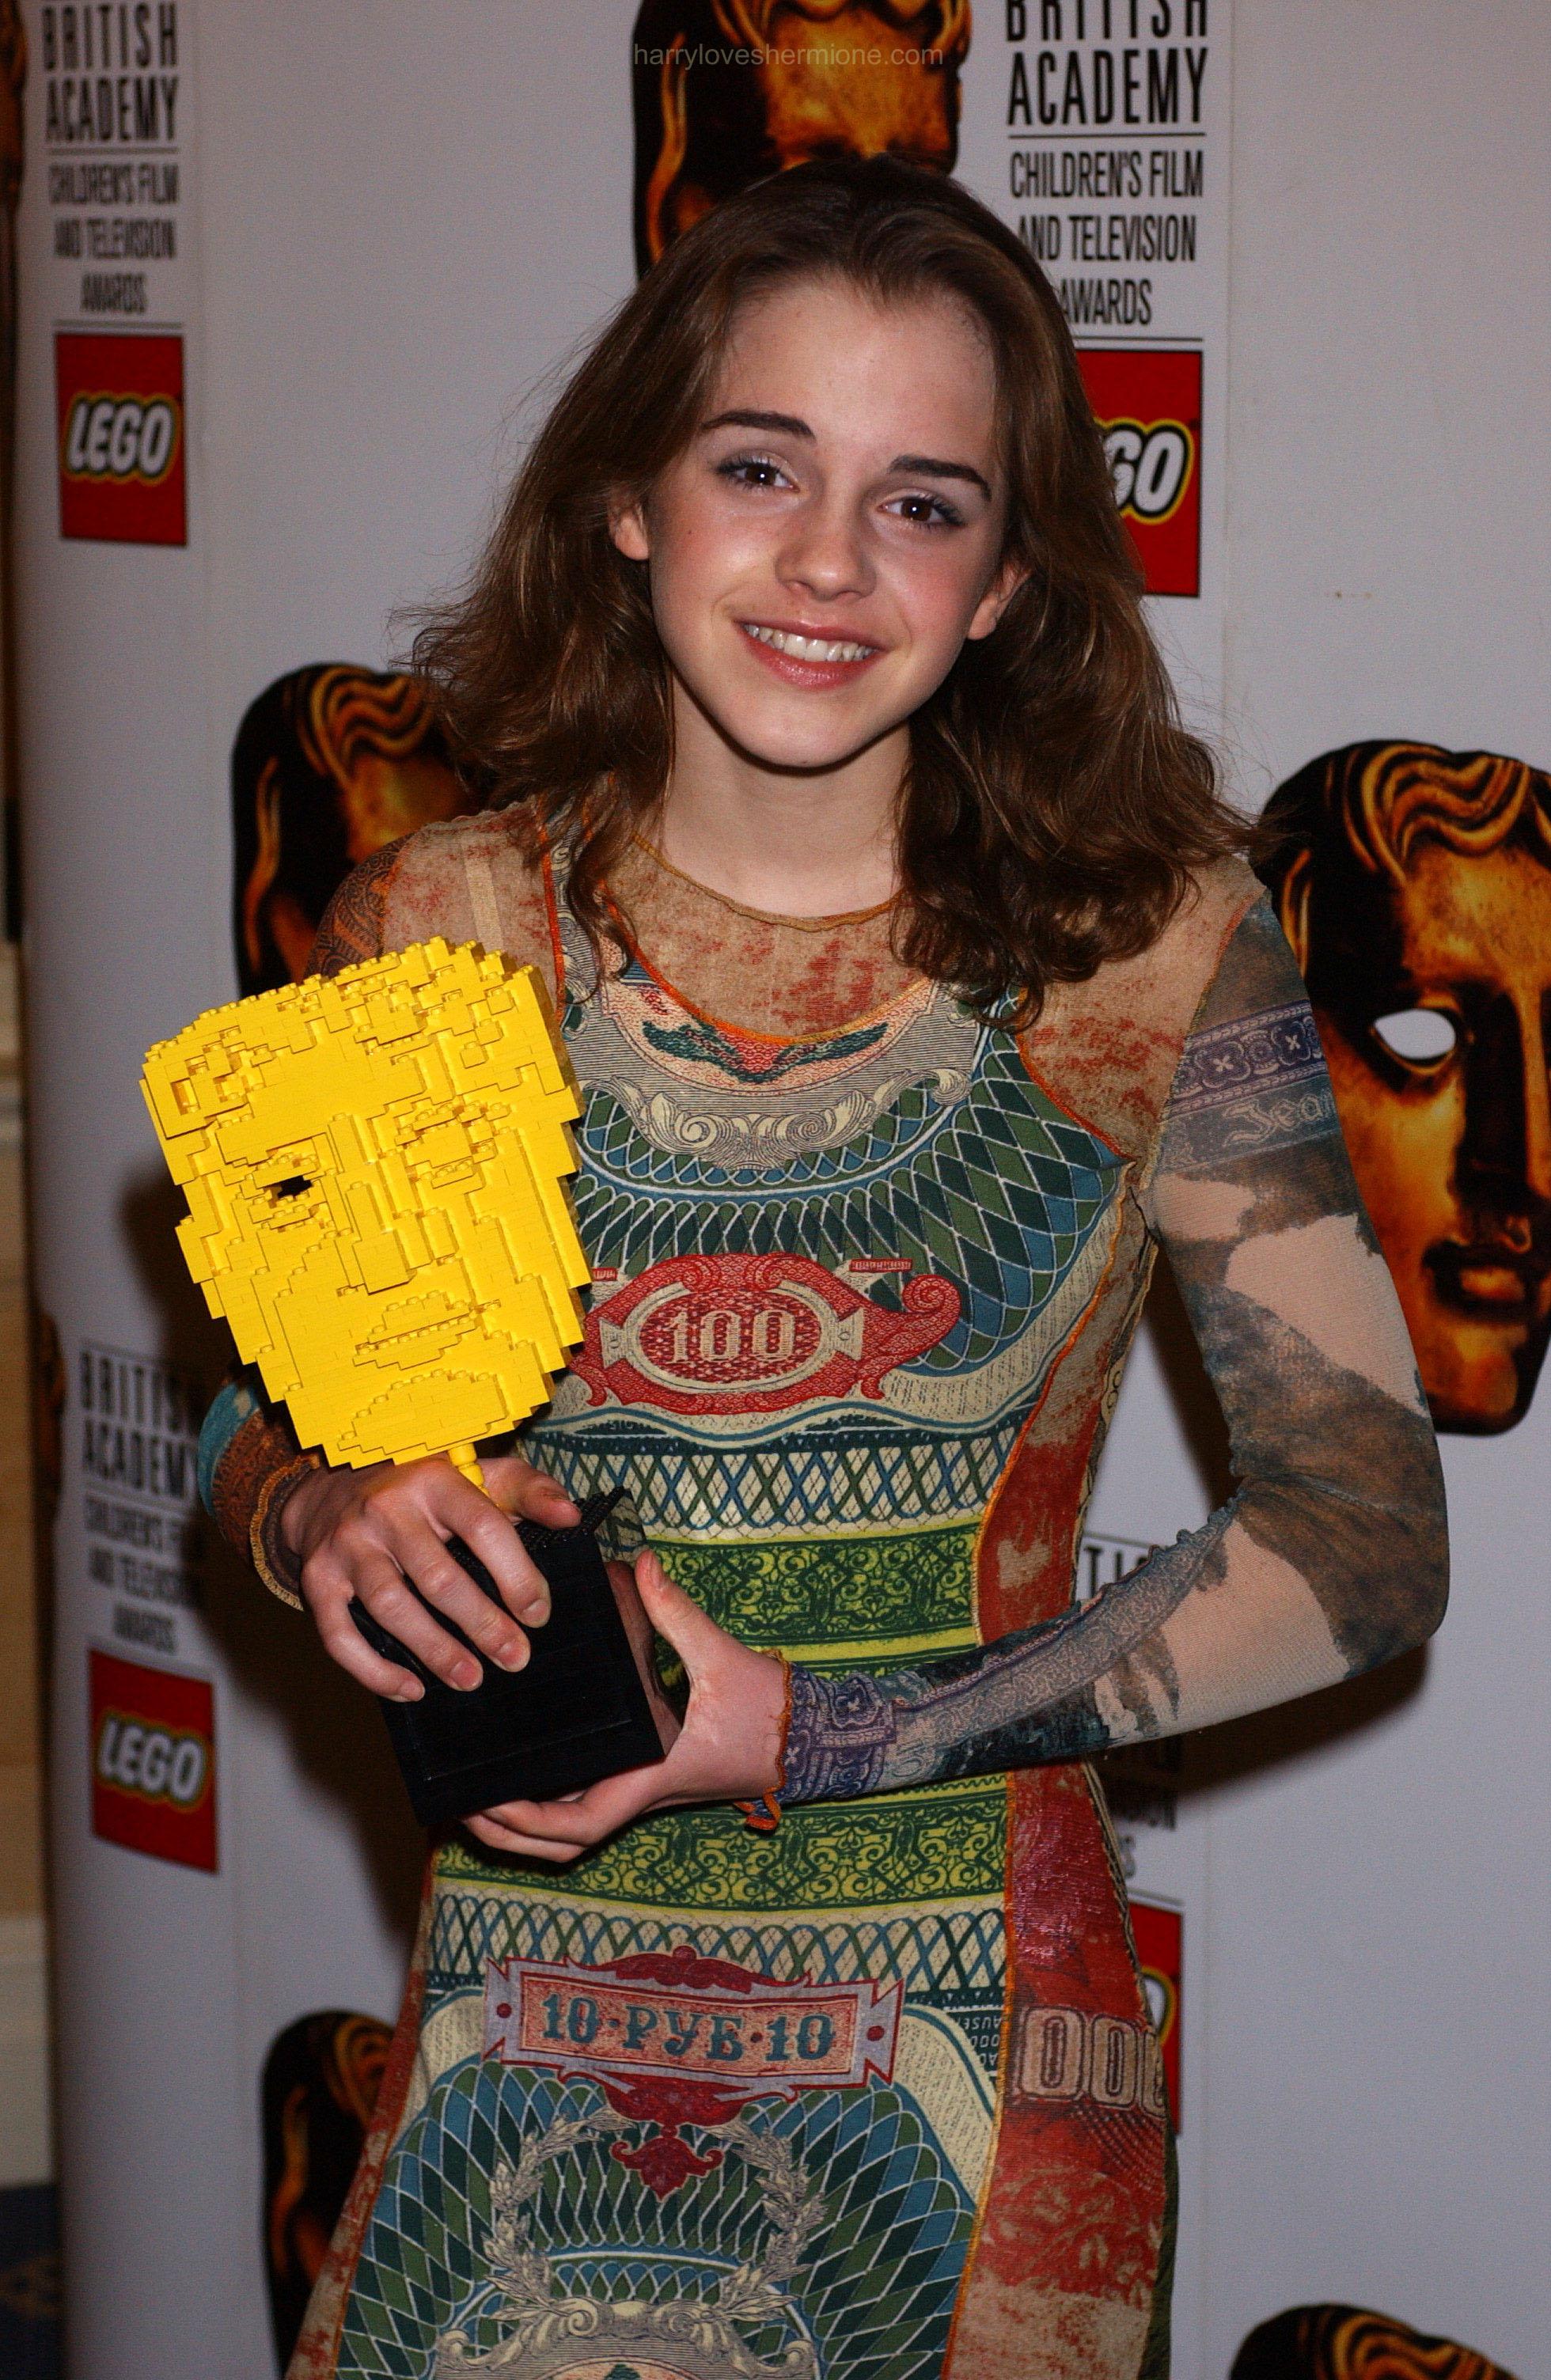 British Academy Childrens Film and Television Awards ... Emma Watson Movies